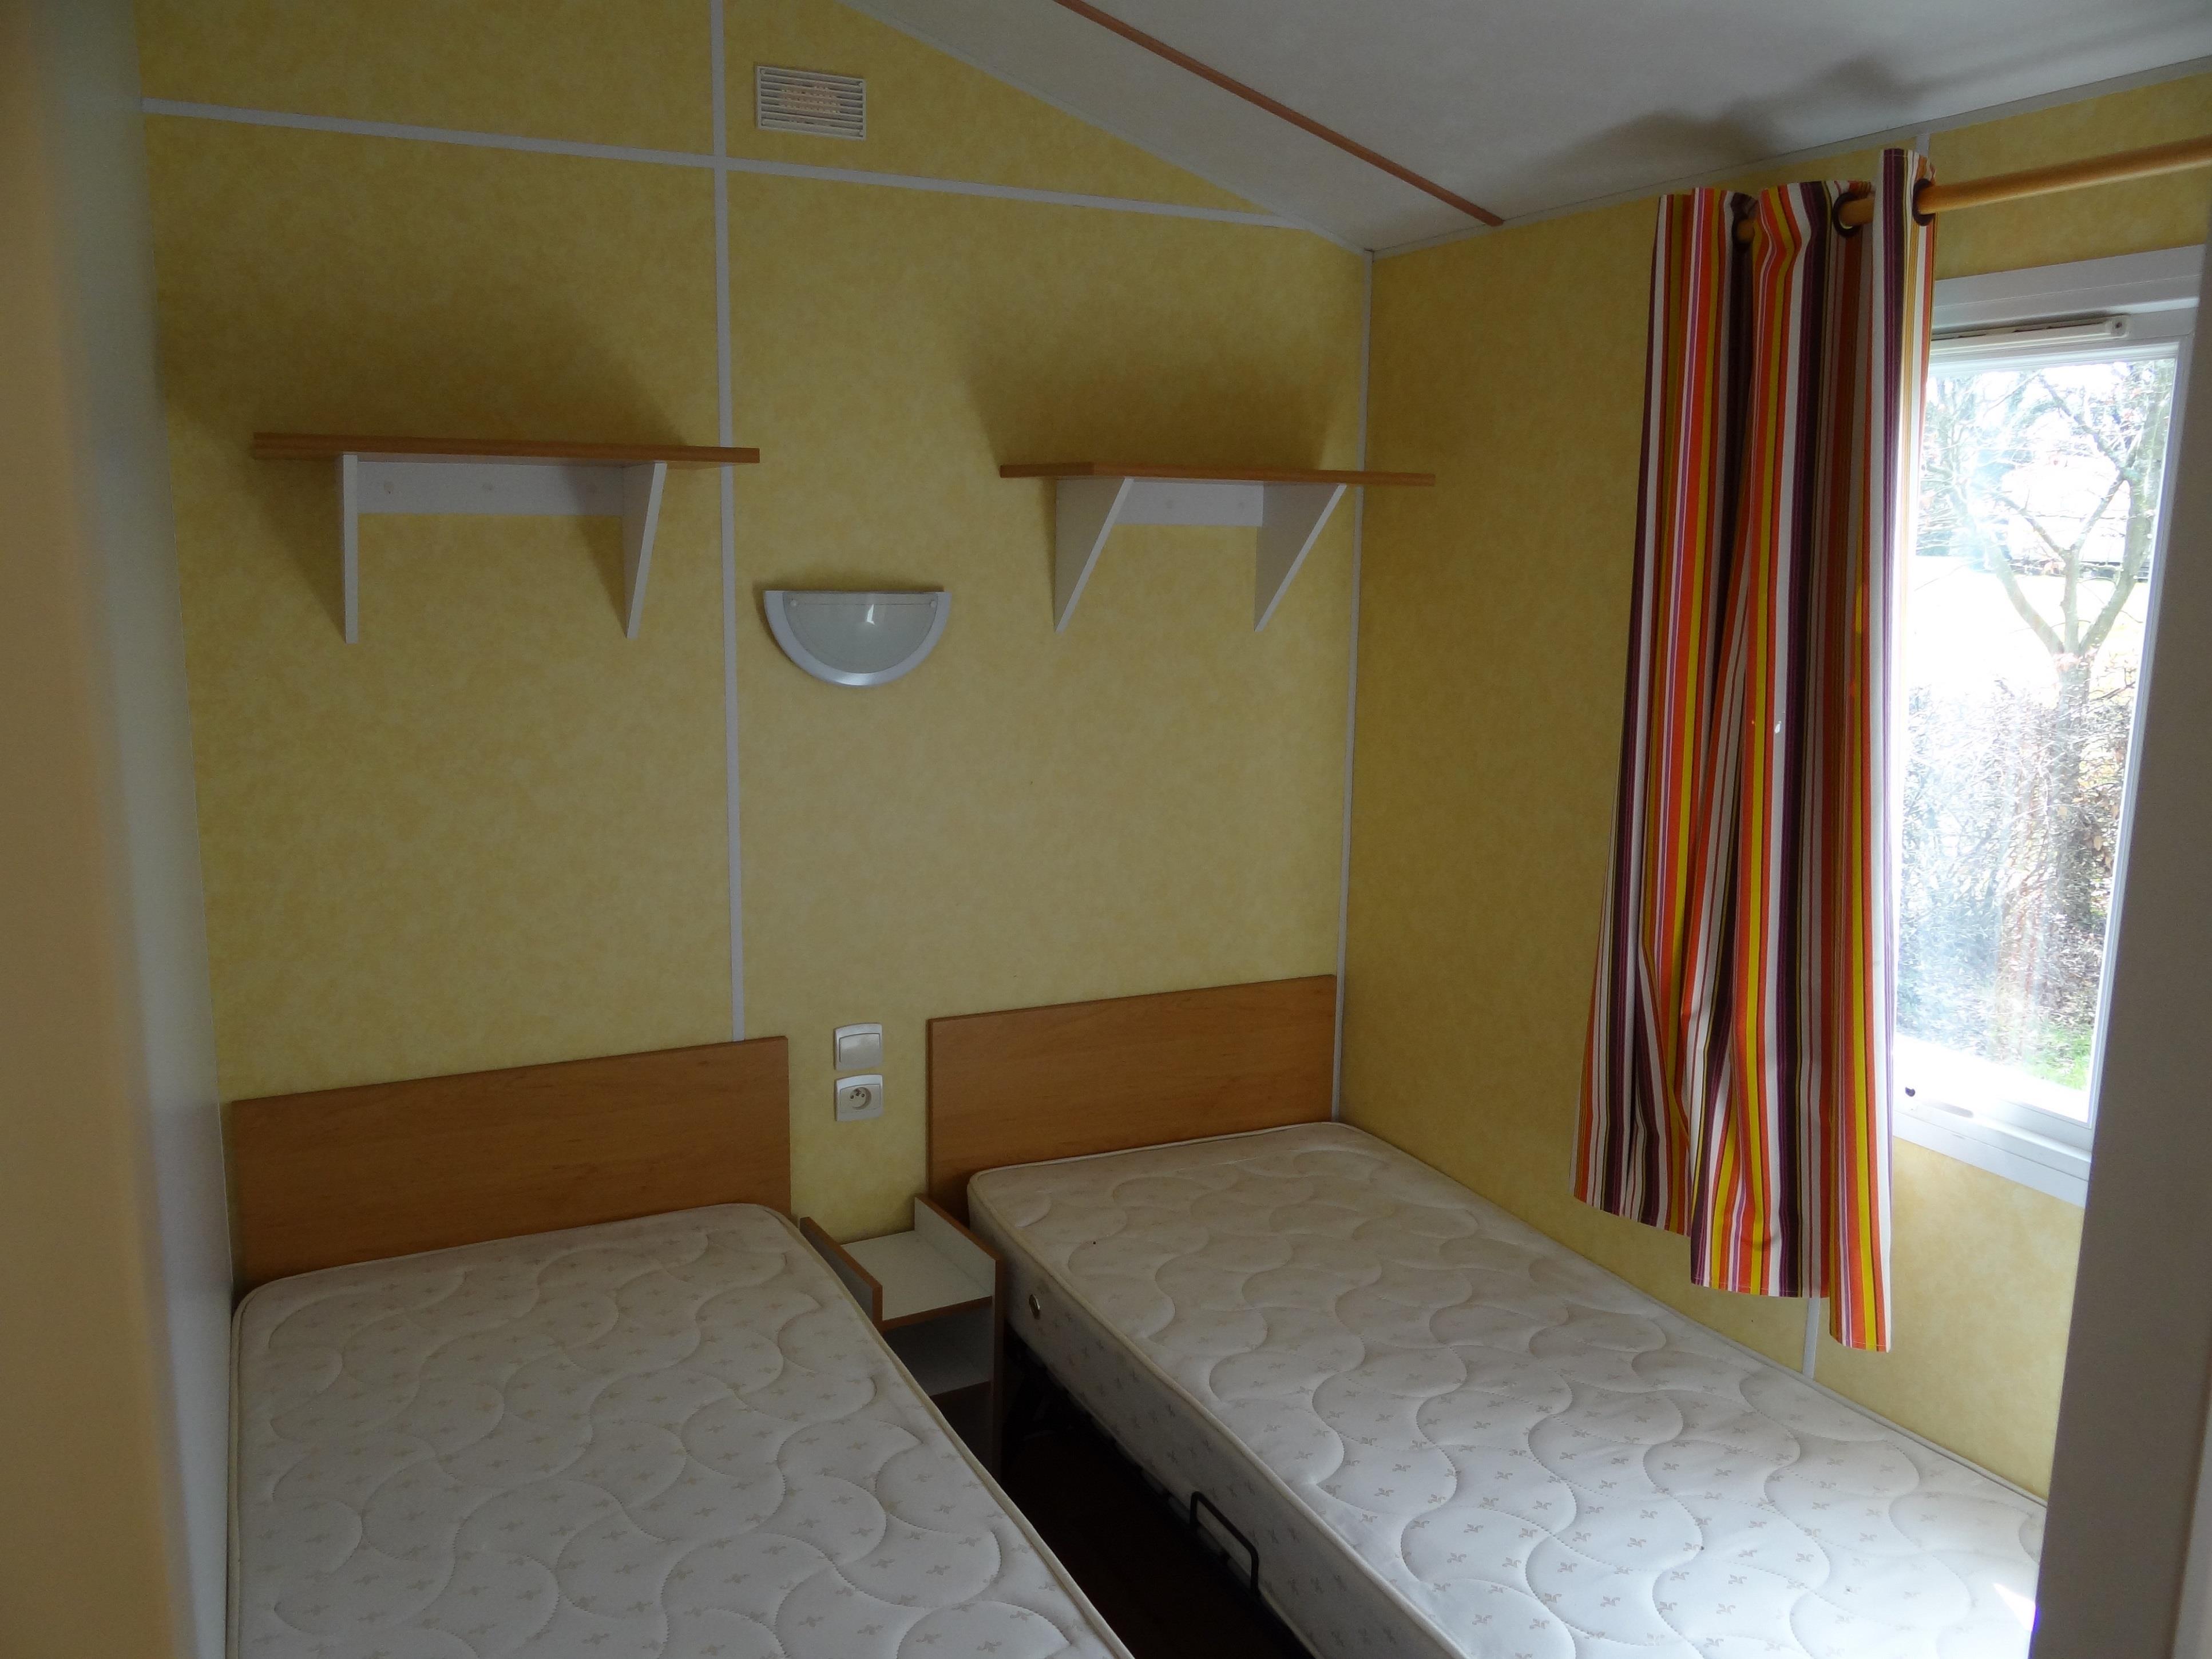 Mobile Home E 2 chambres (sans draps ni serviettes)